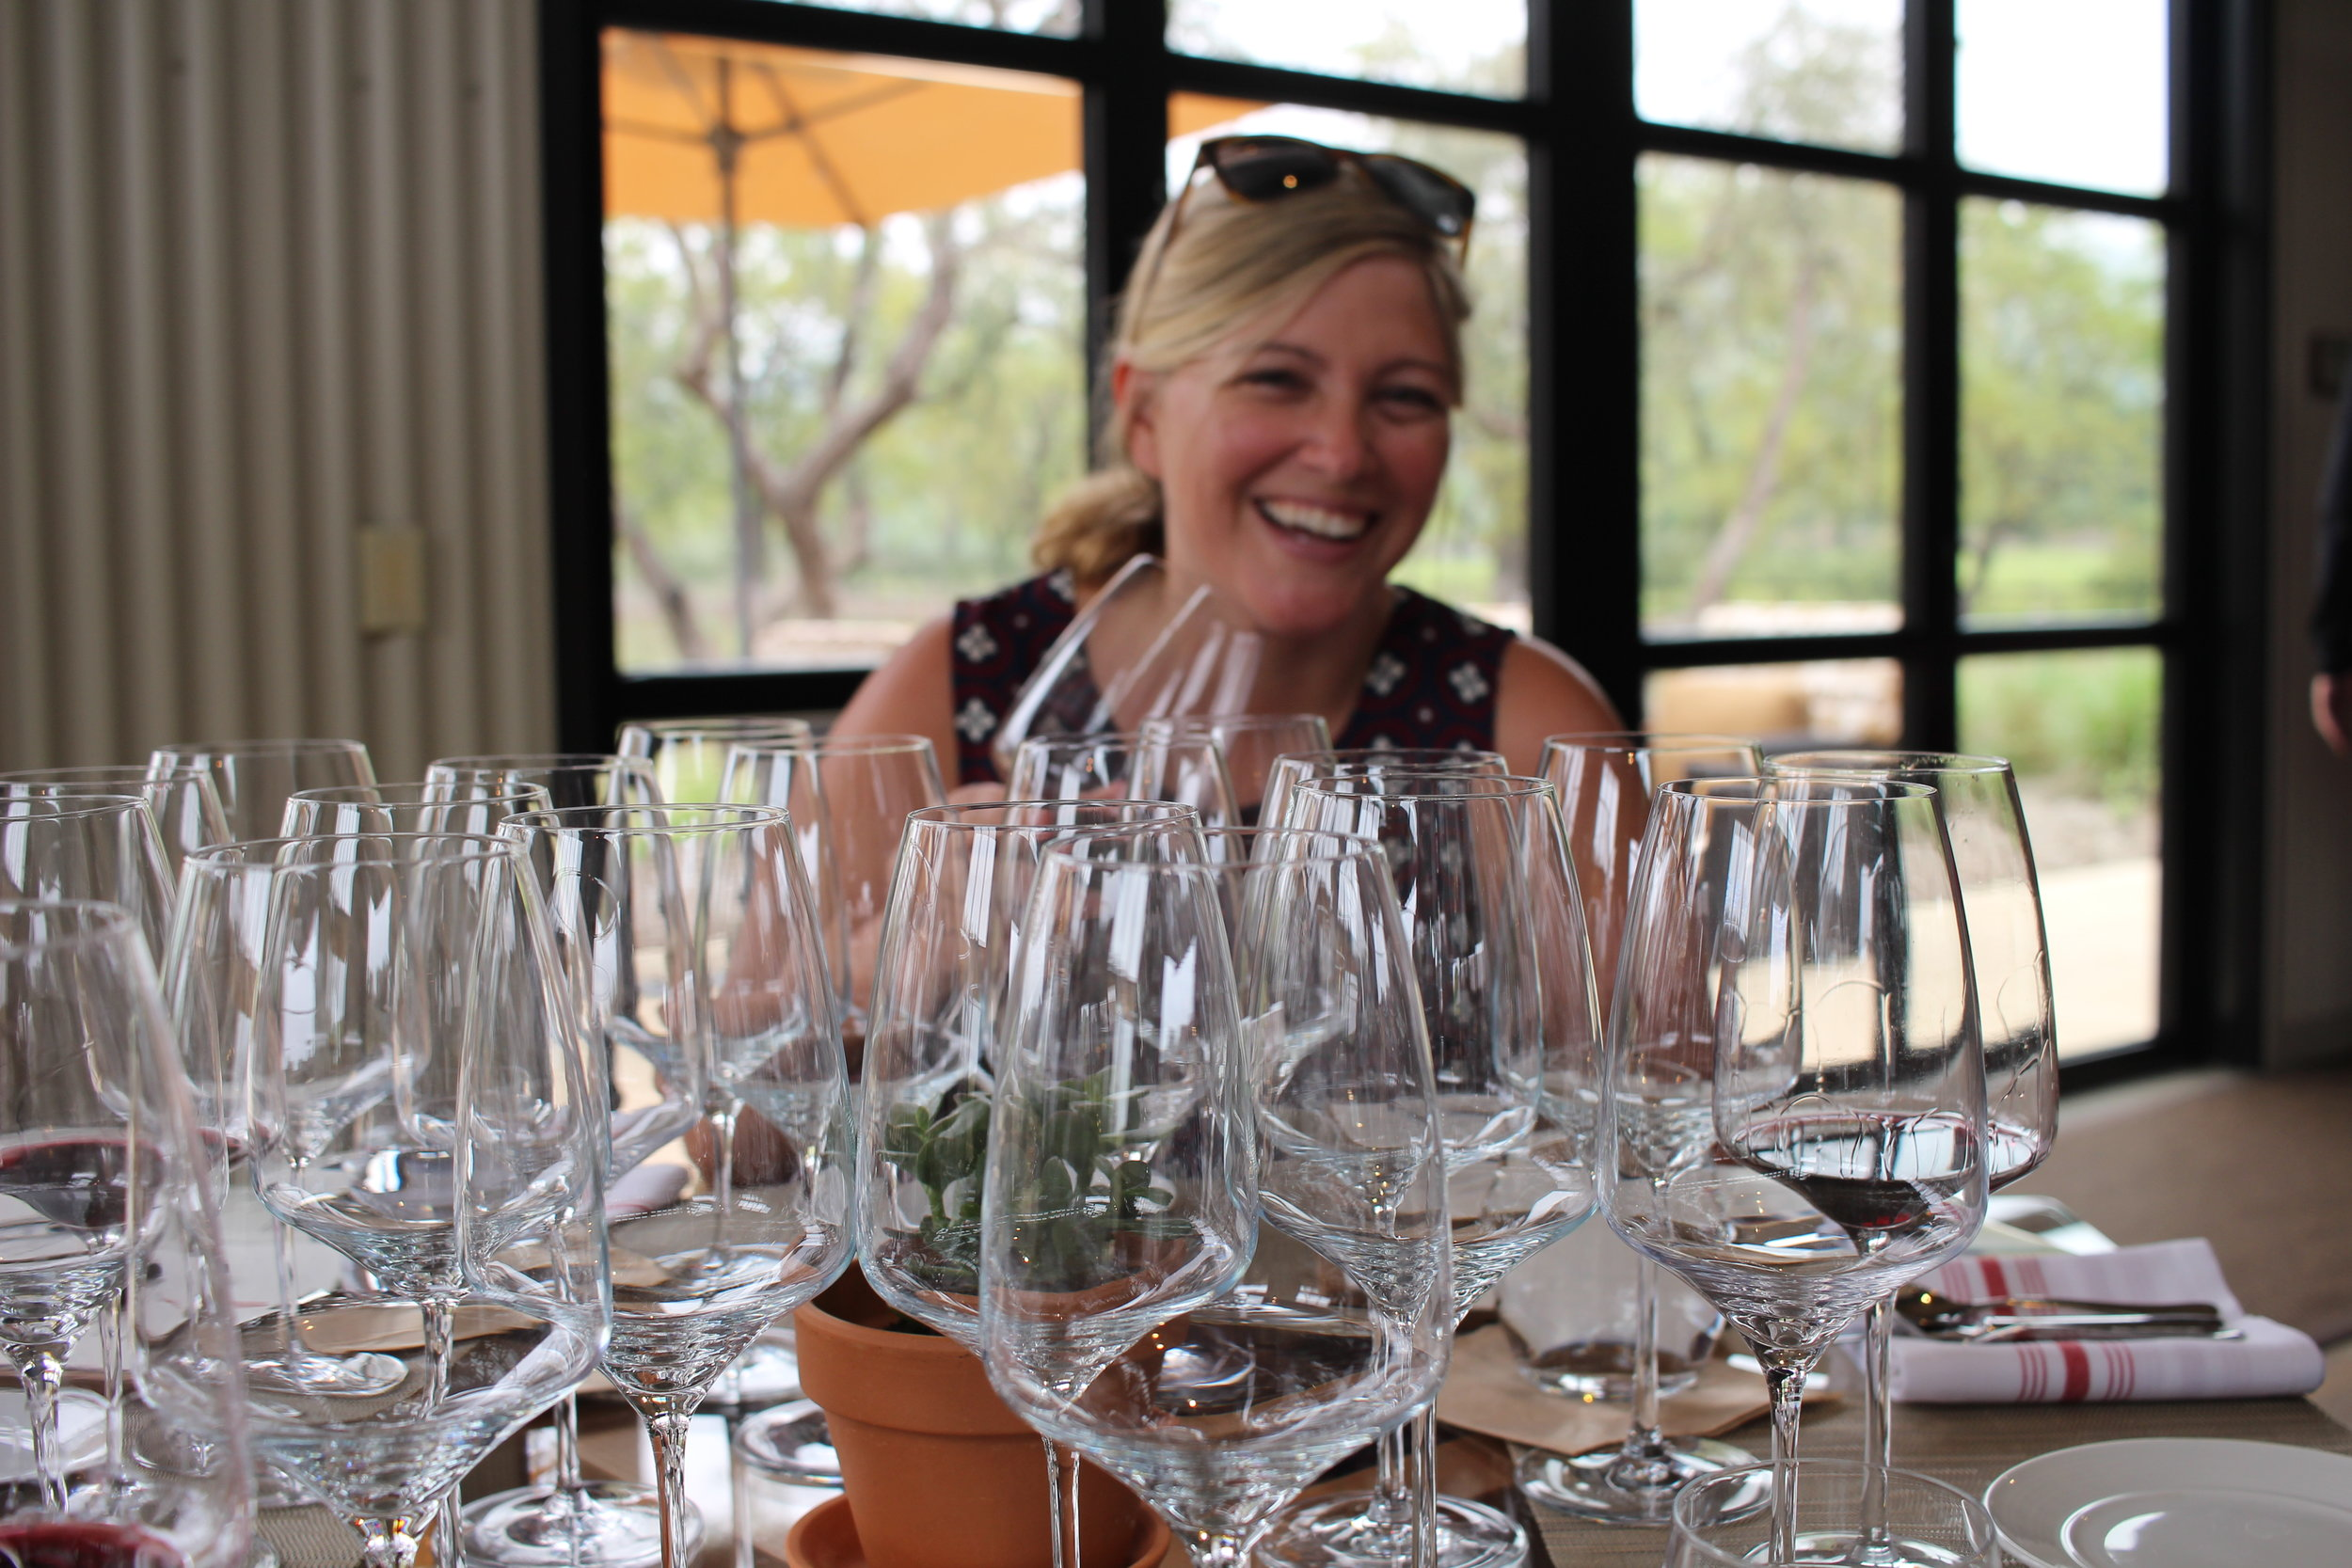 Meet Jamie, the Owner of the Priority Wine Pass